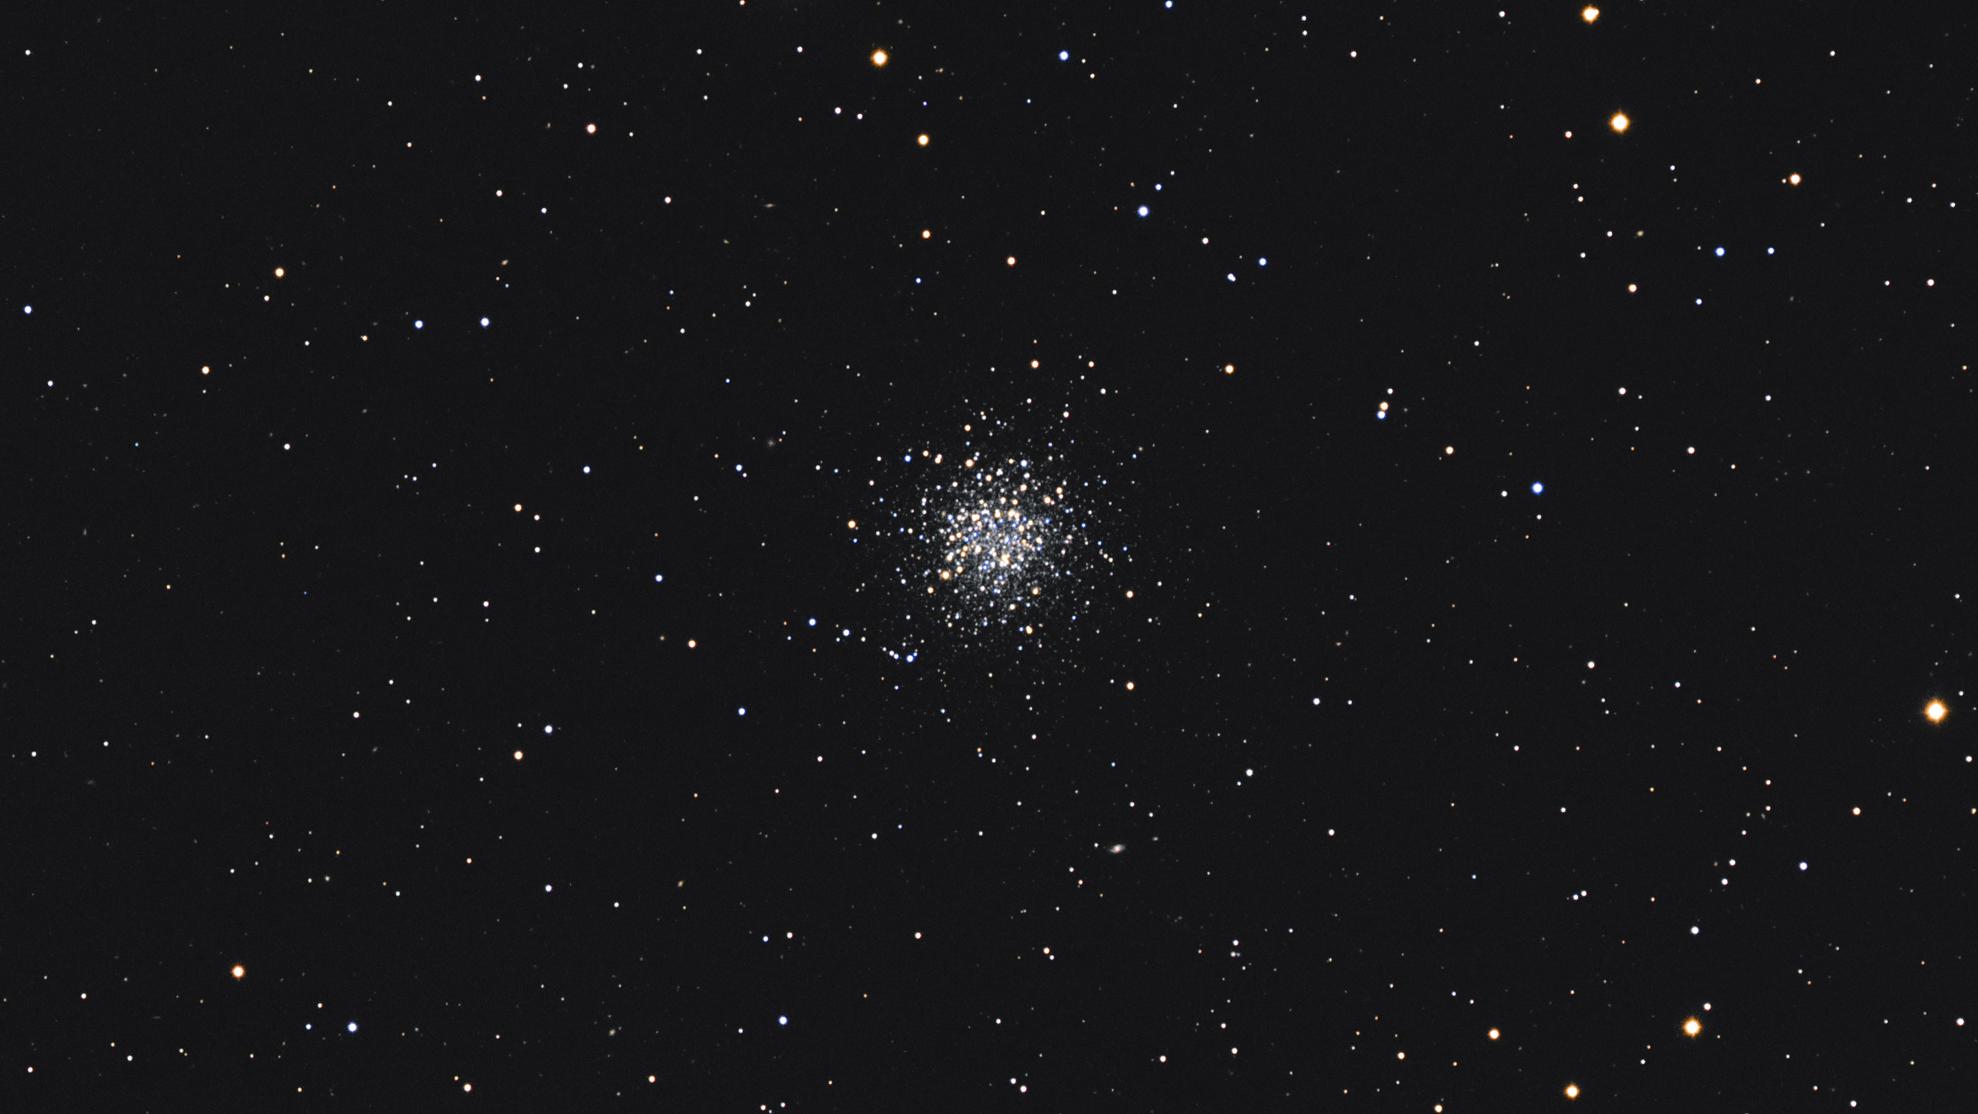 NGC5466-LRGB-20150511-2334-sx-480s-TTK